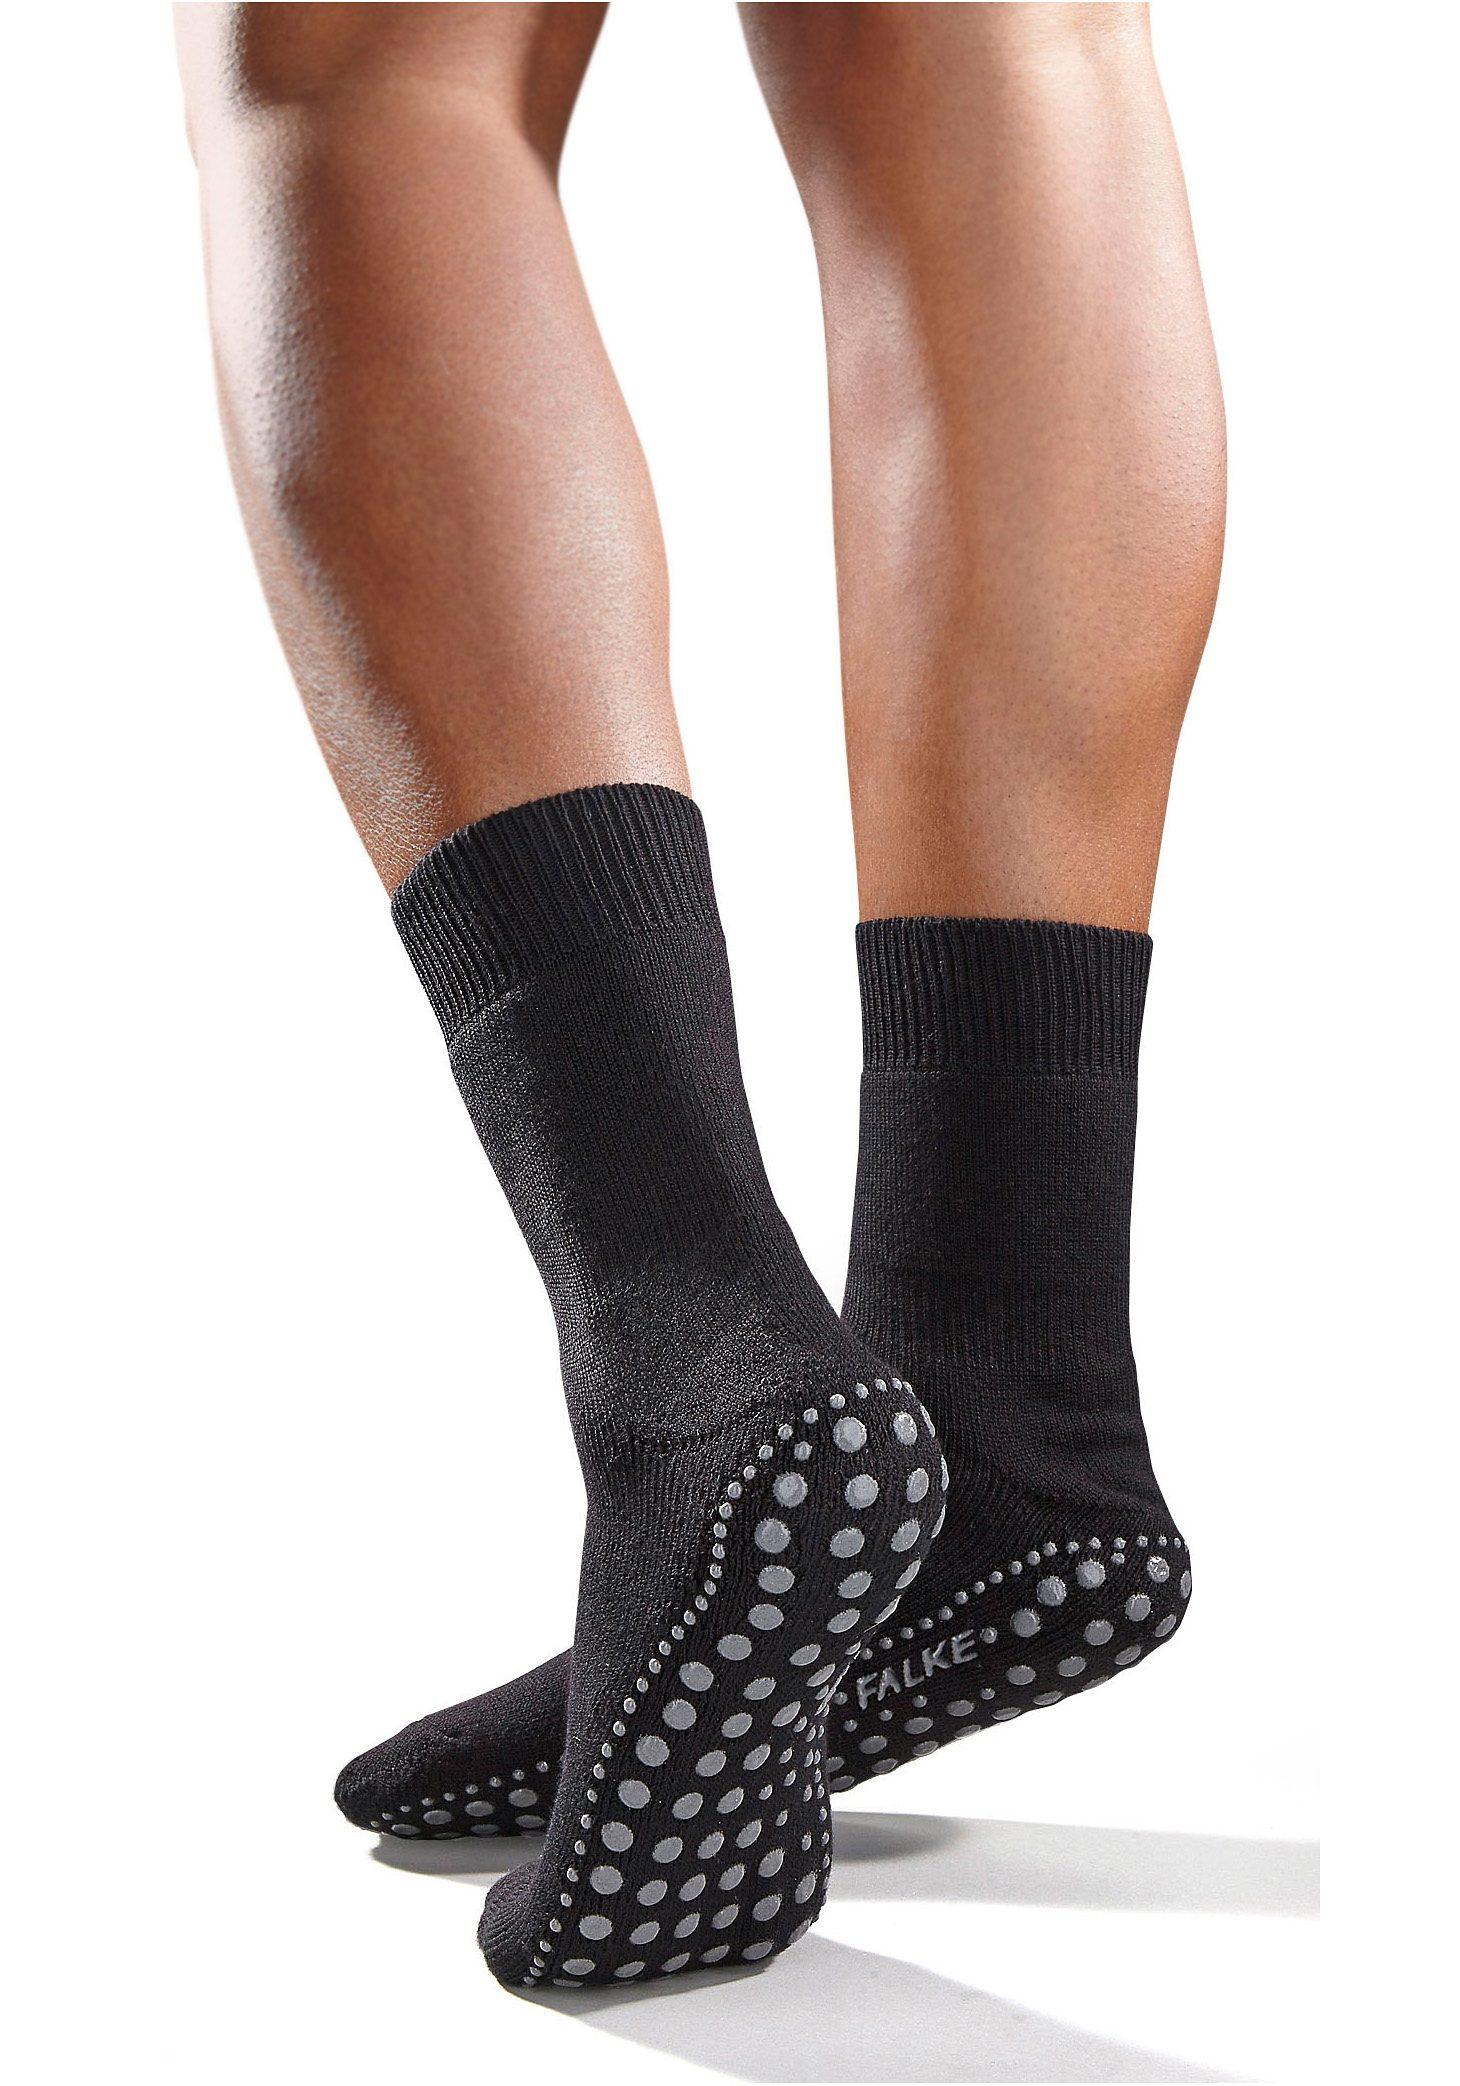 FALKE ABS-Socken Homepad (1 Paar)